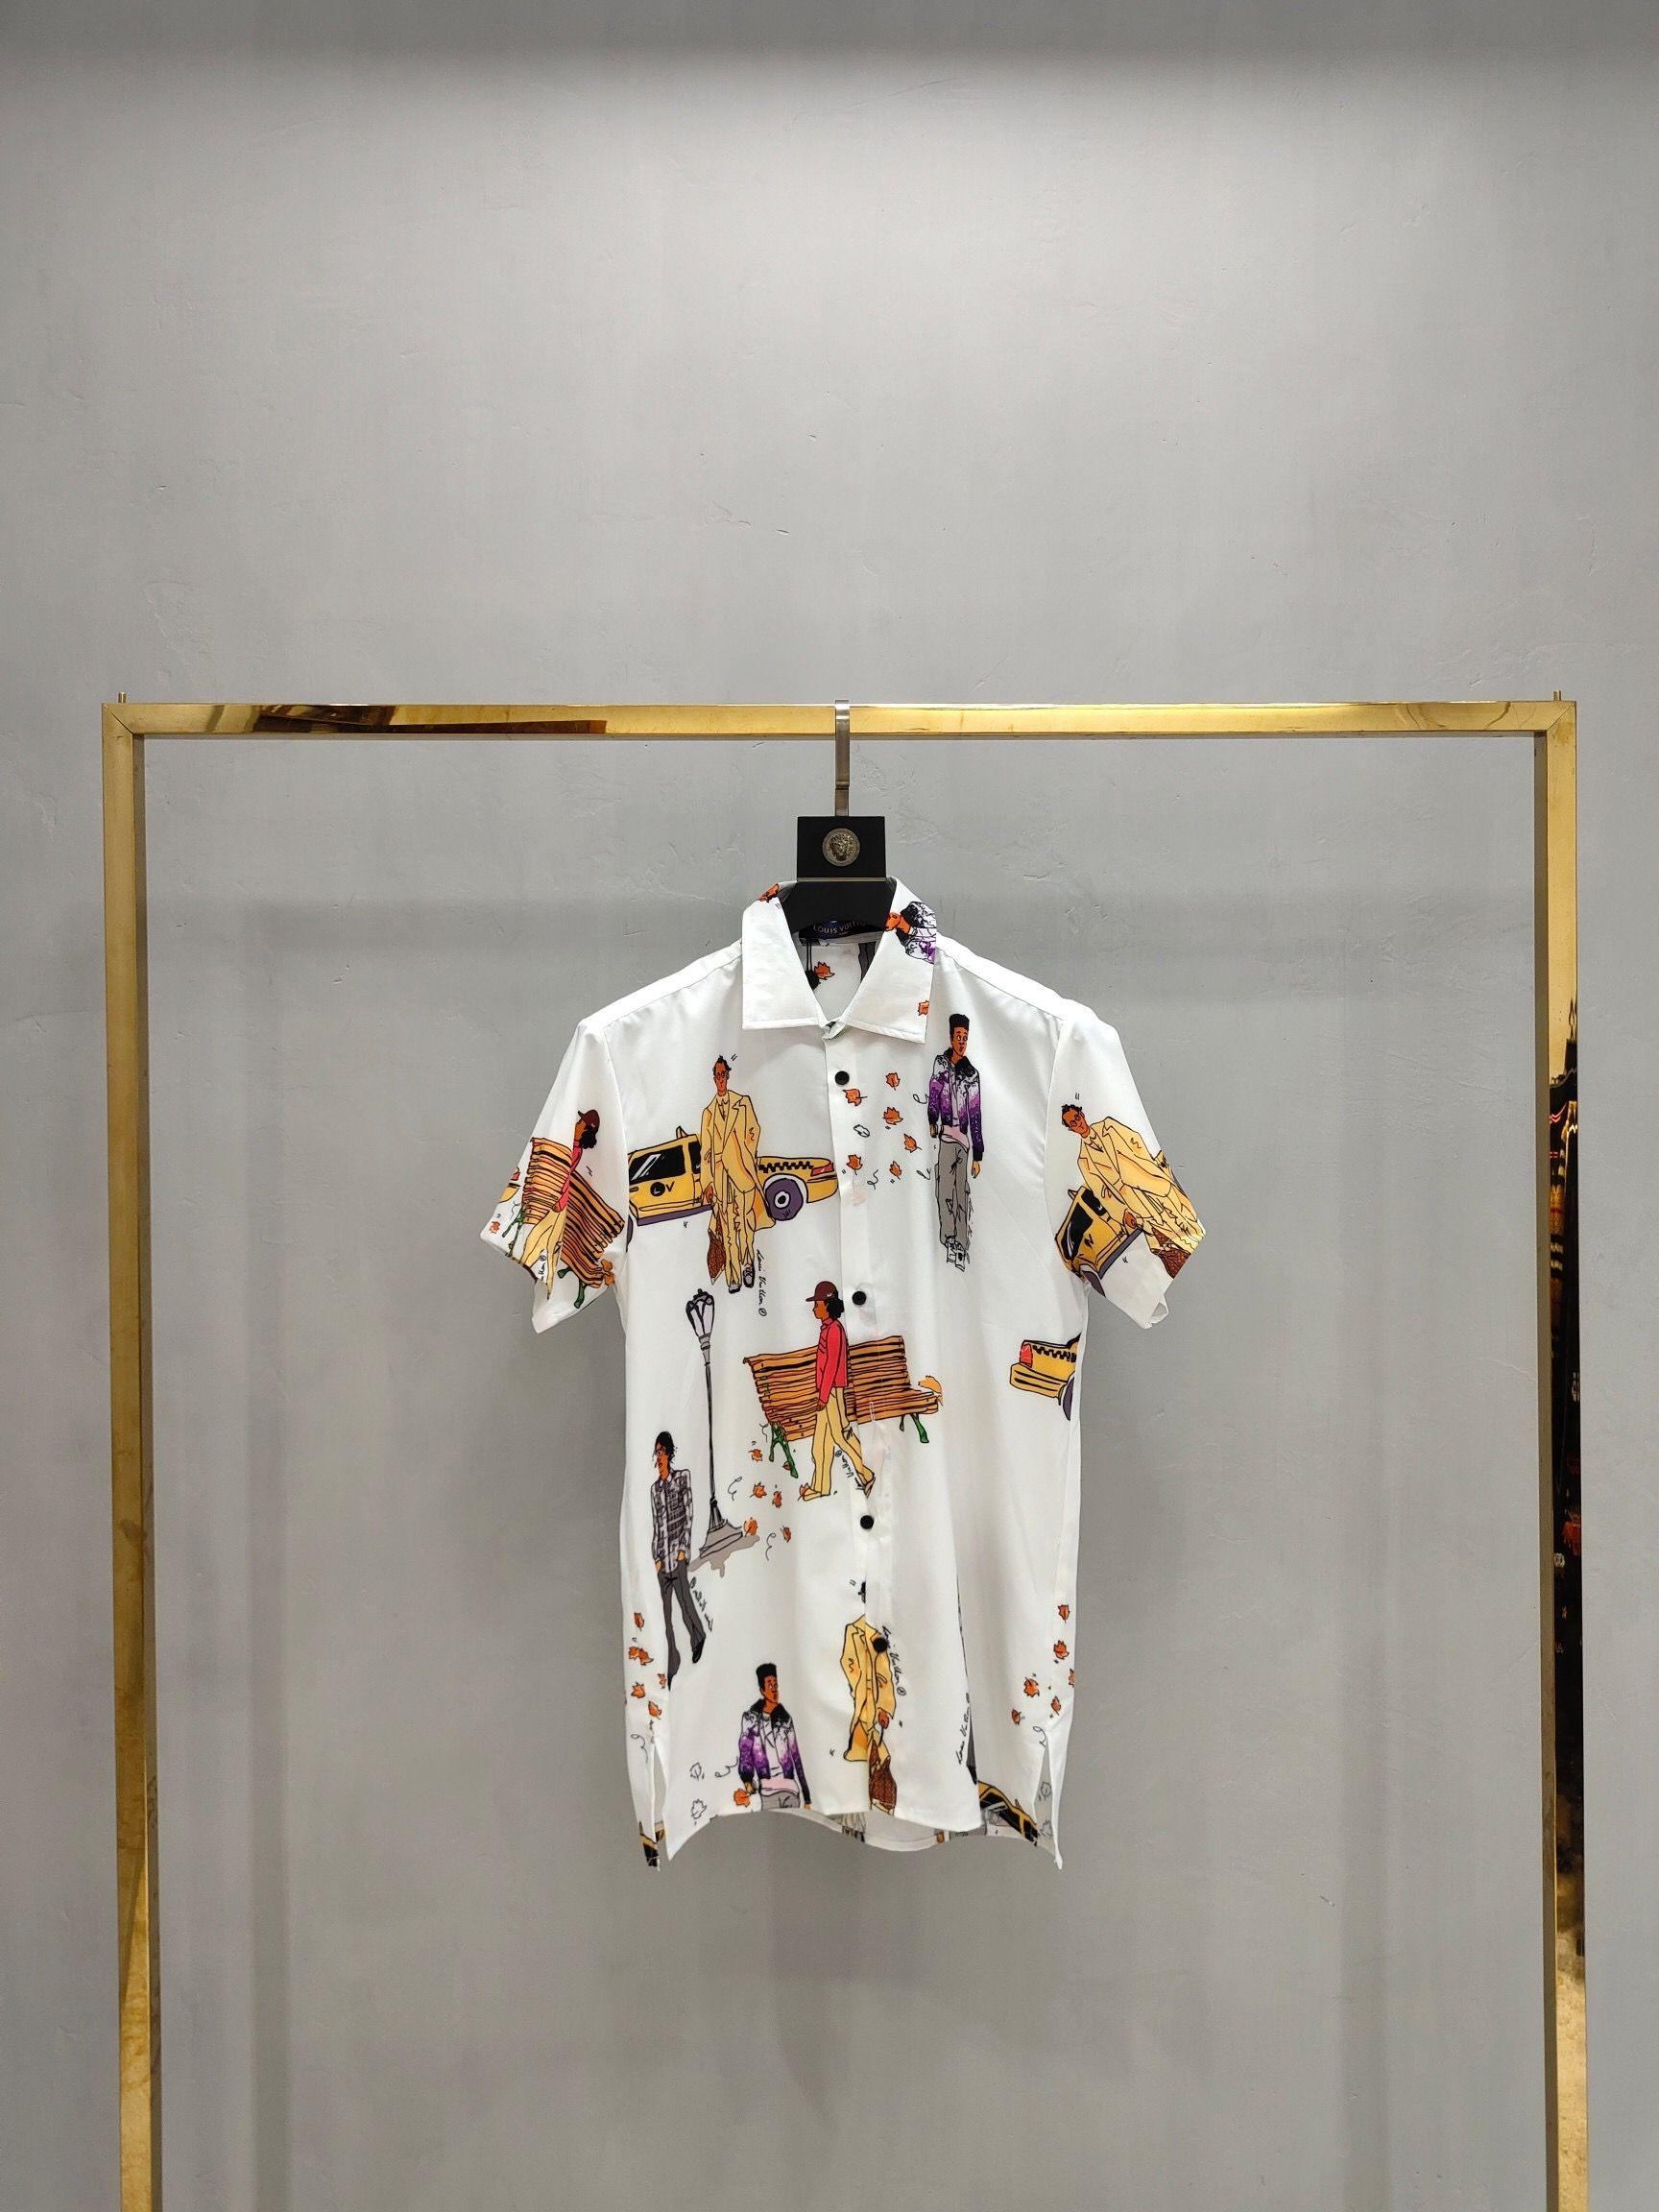 2020 Mens Designer T Shirts Black White Red Mens Fashion Designer T Shirts Top Short Sleeve The high quality S-XXL131